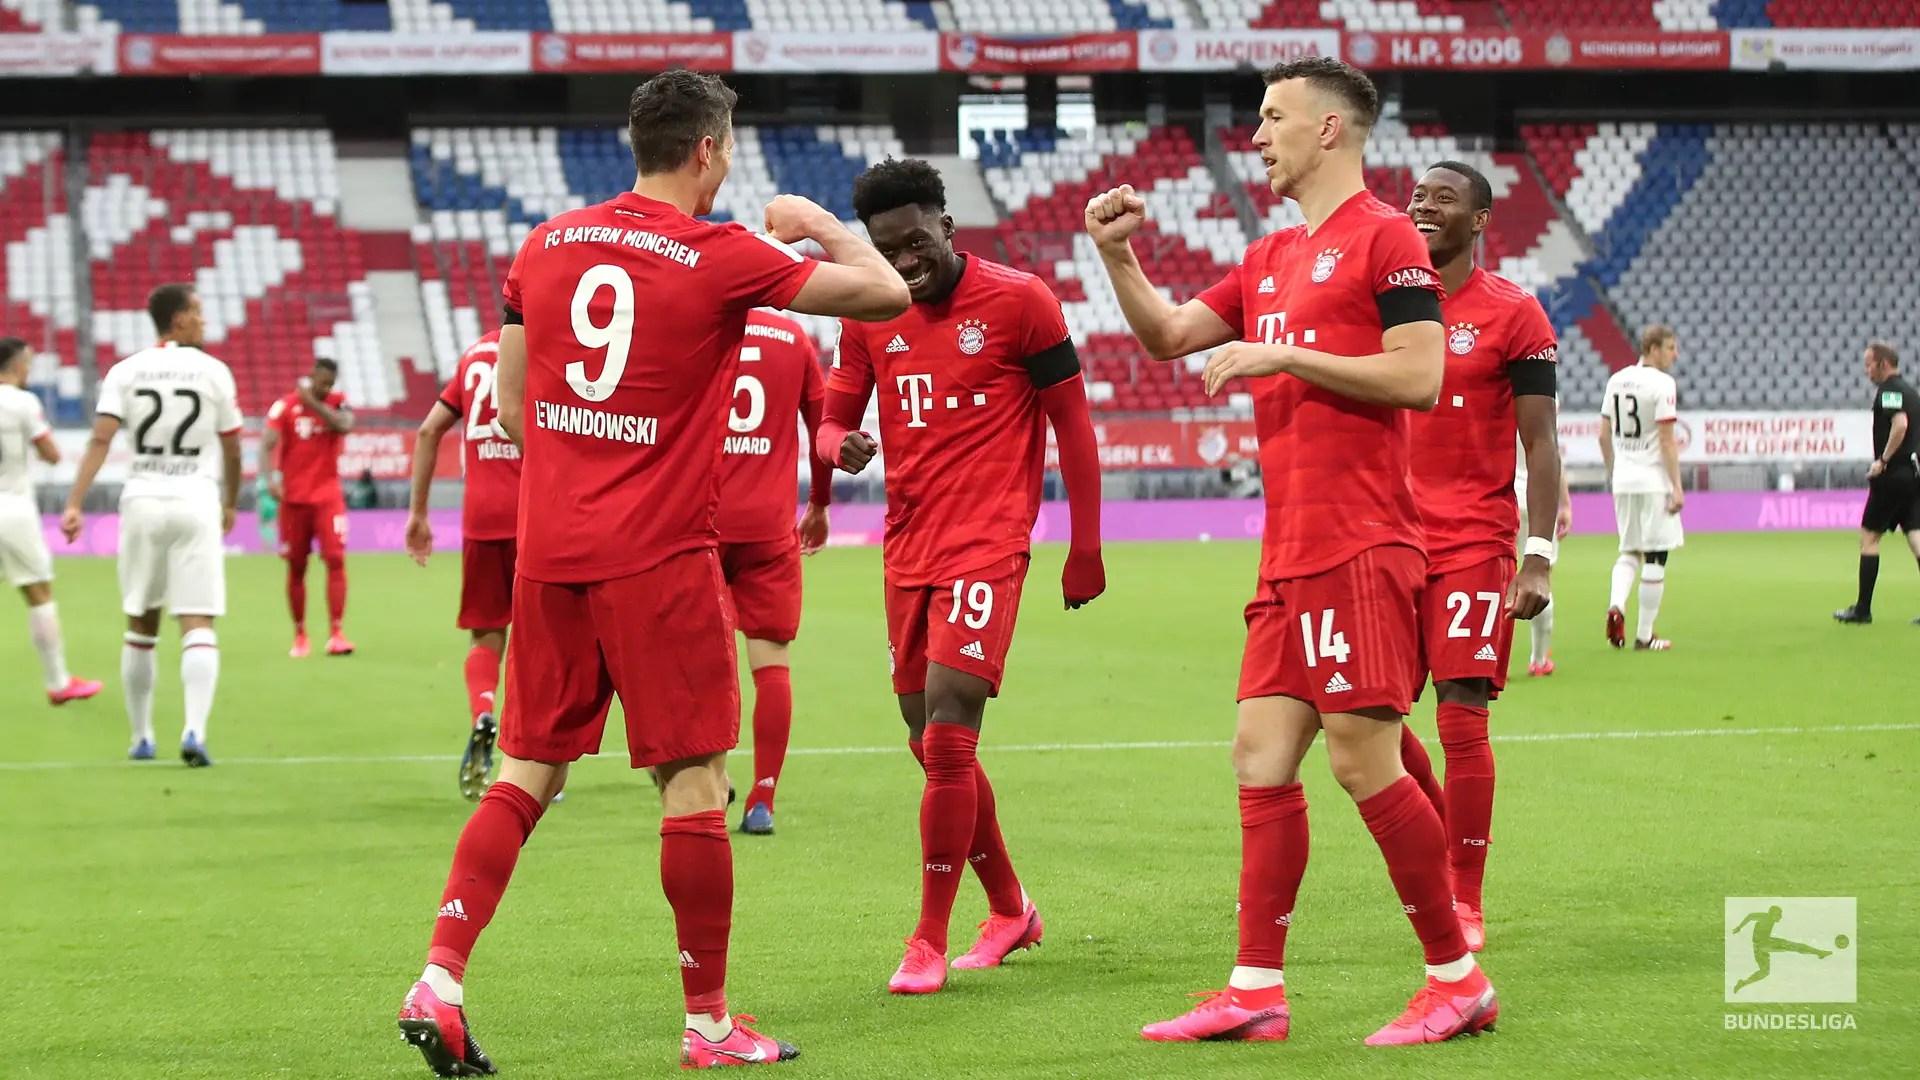 Bundesliga: Bayern Outclass Frankfurt 5-2 At Allianz Arena